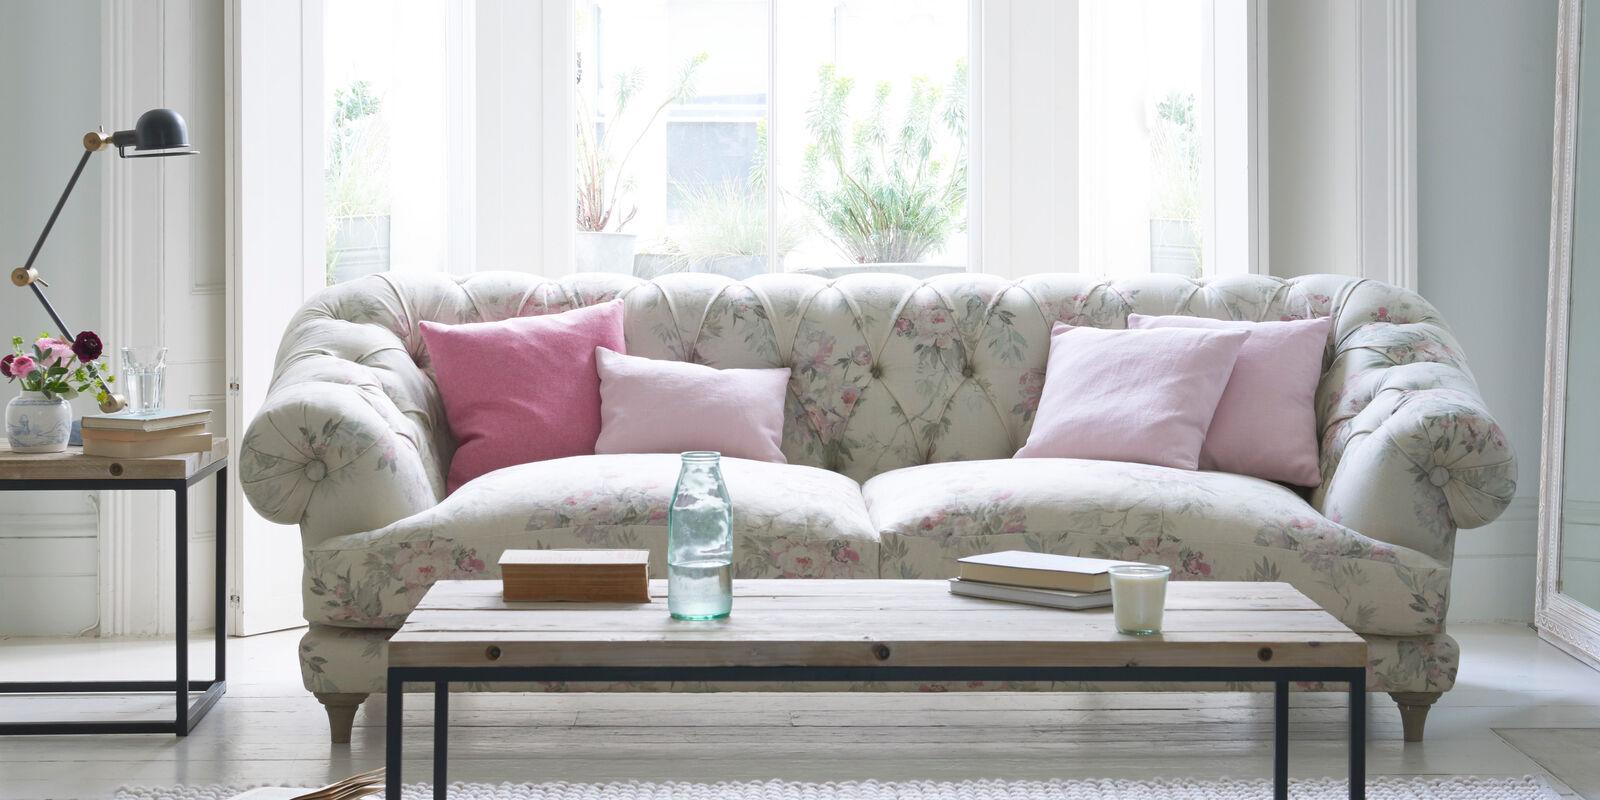 Bagsie chesterfield sofa in Vintage Rose linen